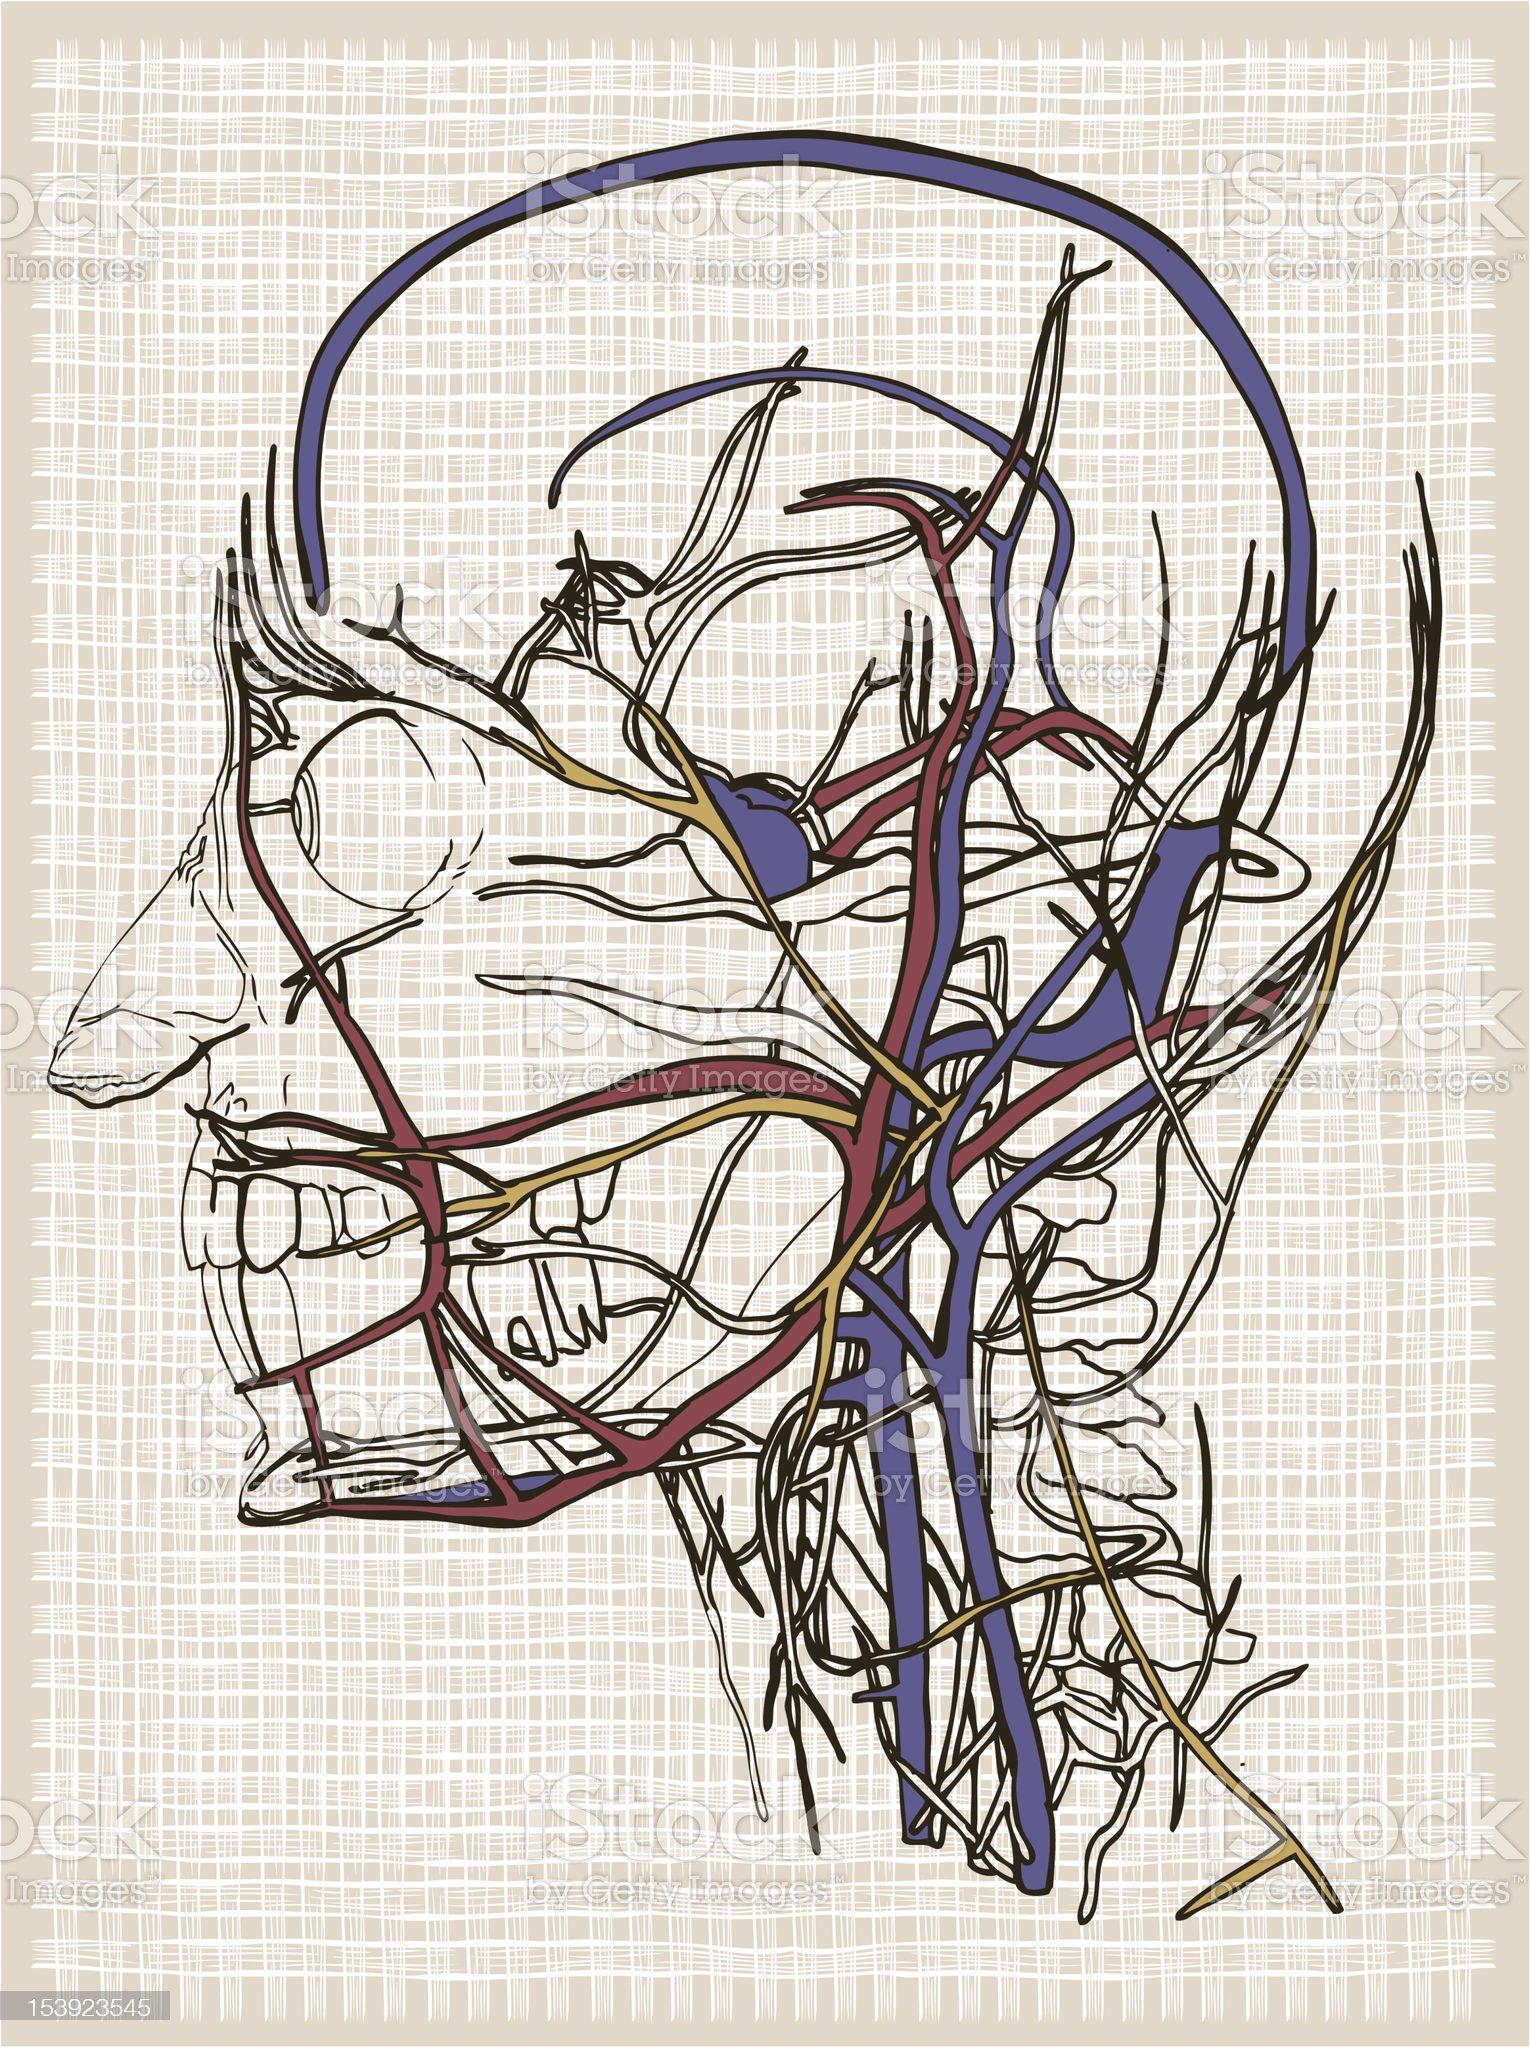 Human anatomy head. Drawing royalty-free stock vector art